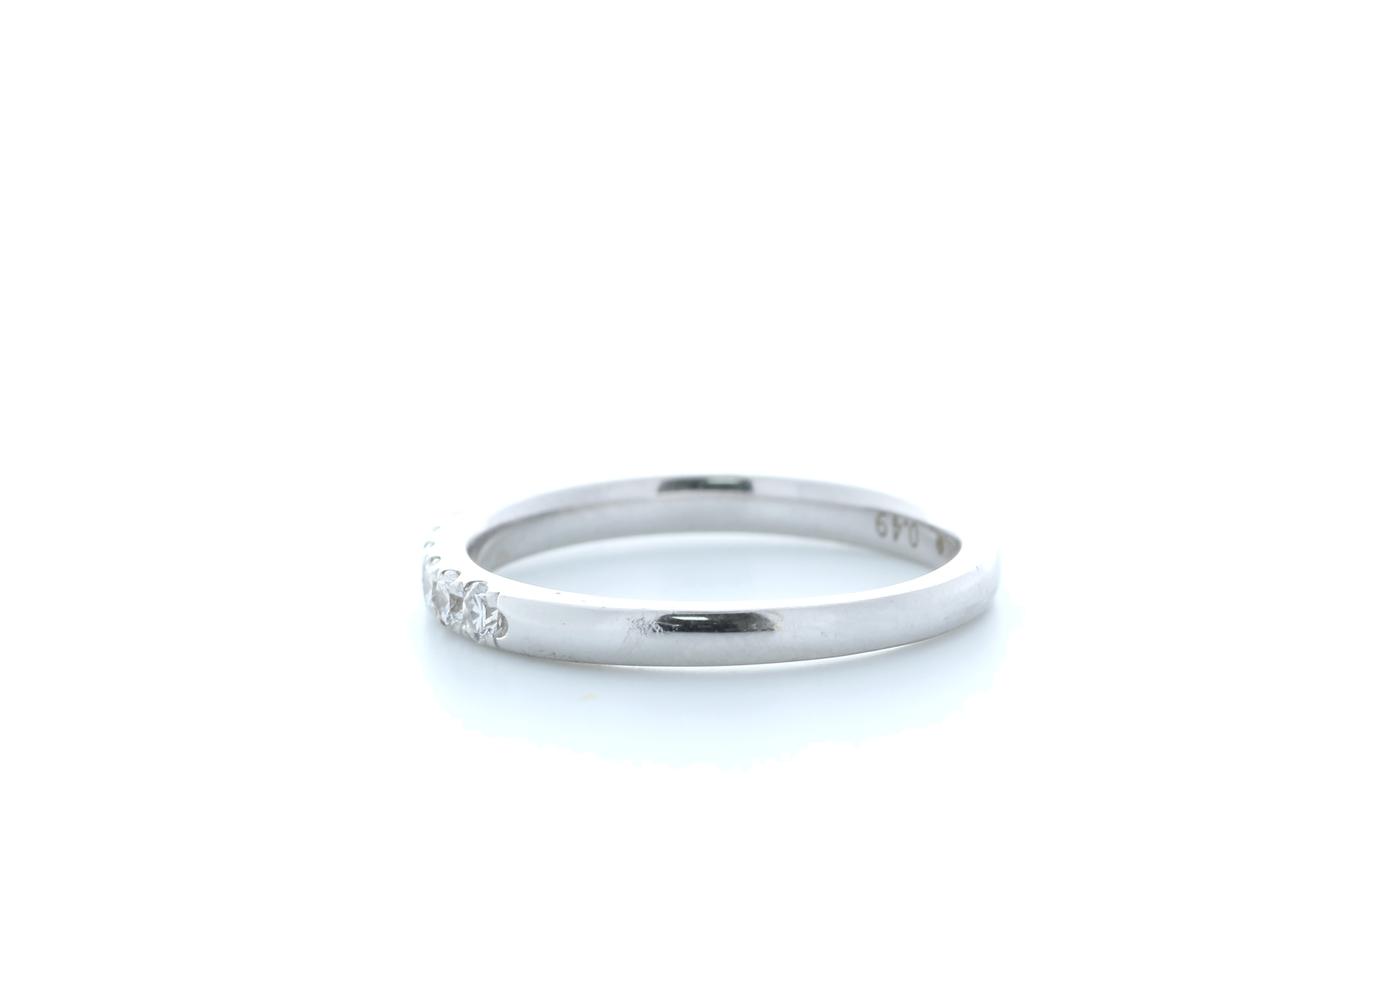 18ct White Gold Claw Set Semi Eternity Diamond Ring 0.35 Carats - Image 3 of 4